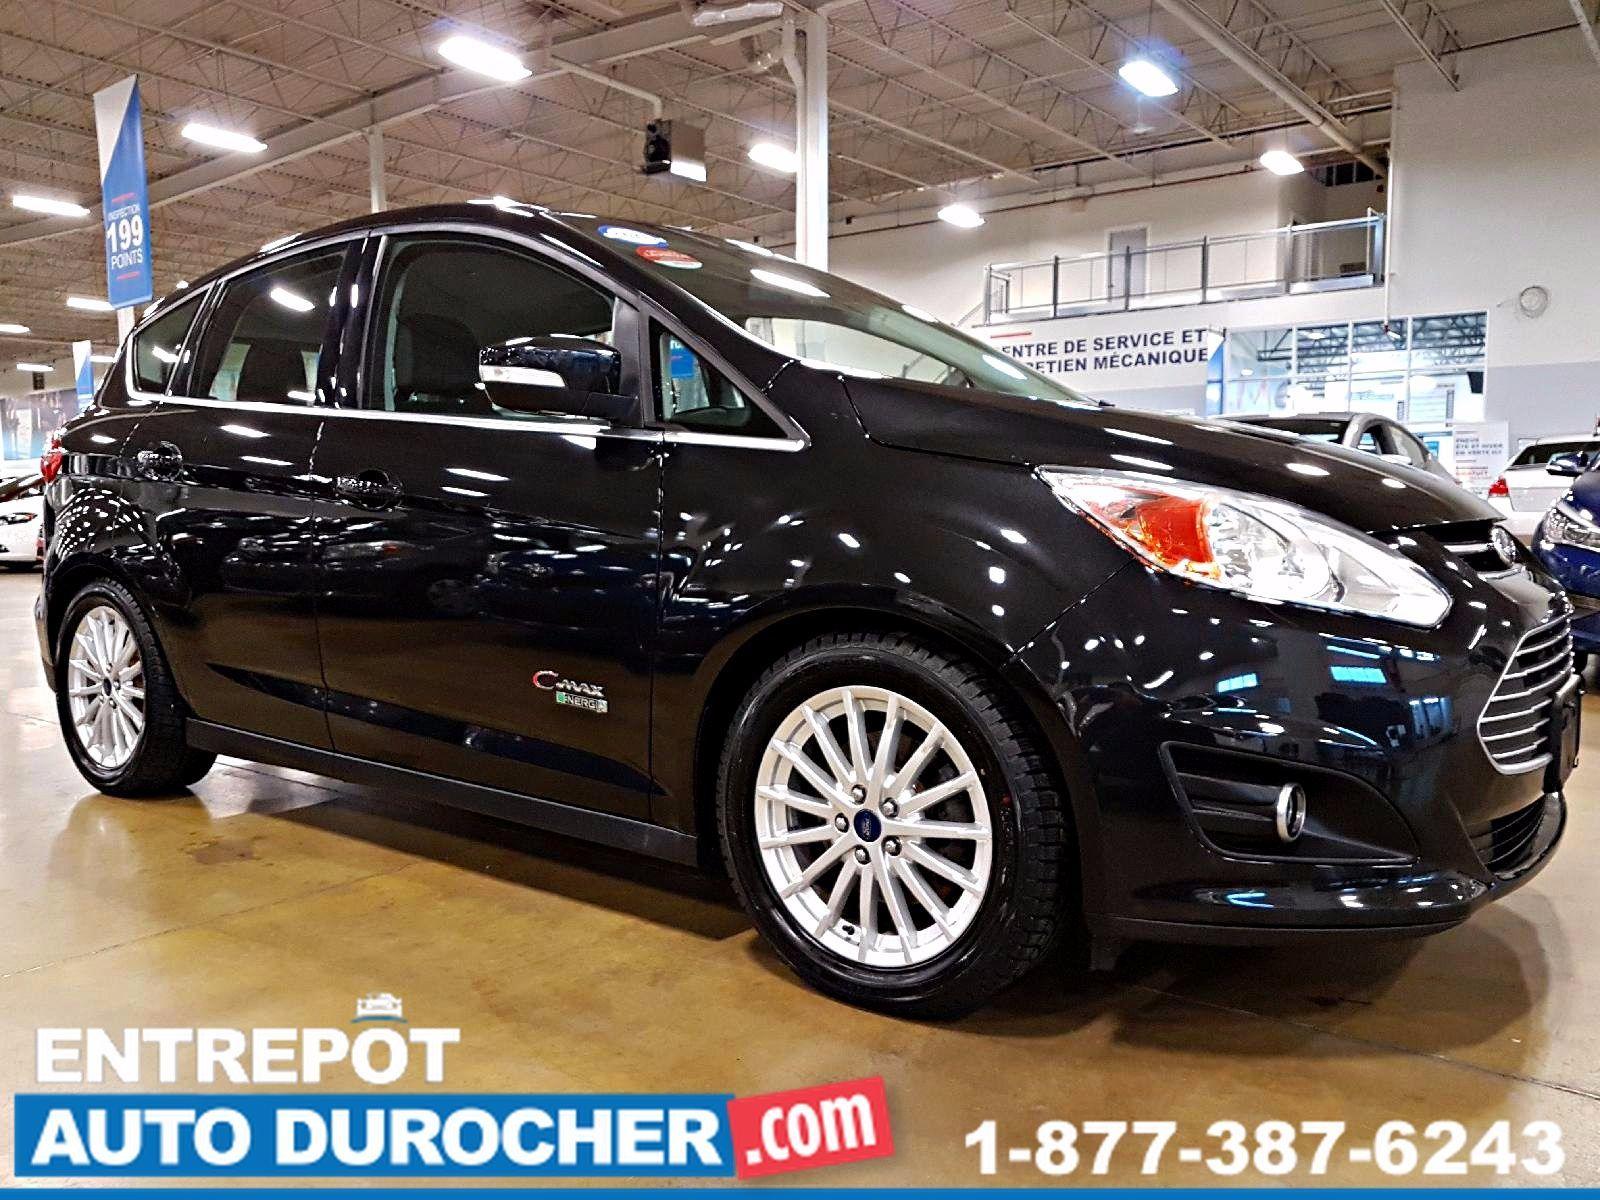 2013 Ford C-Max Energi SEL - AUTOMATIQUE - CUIR - NAVIGATION -